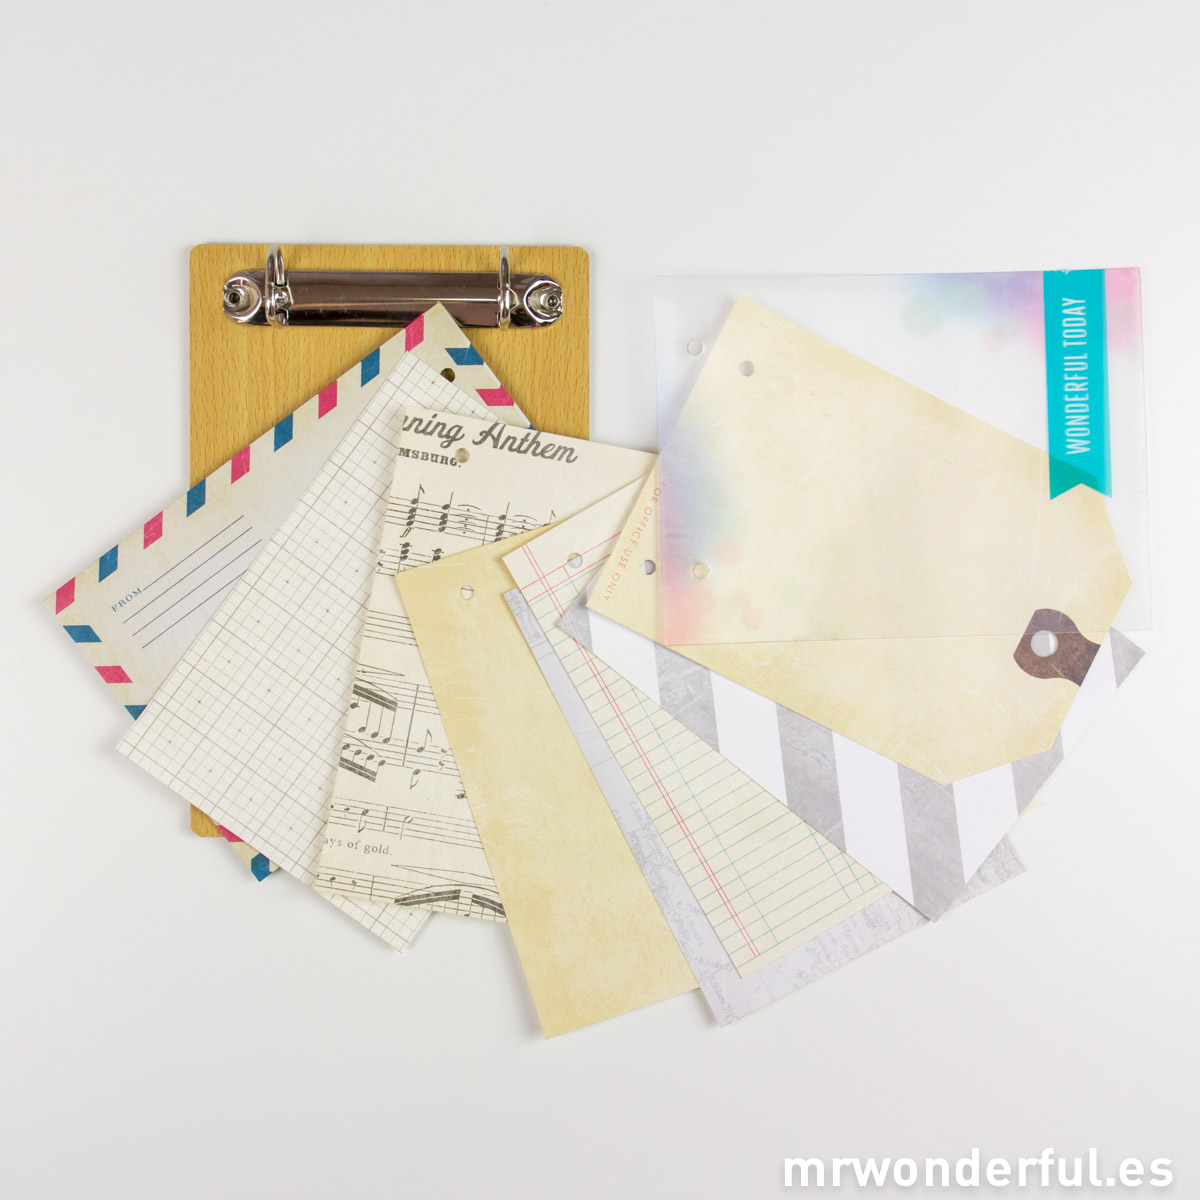 mrwonderful_683168_album-scrapbook-soporte-madera-anillas-13